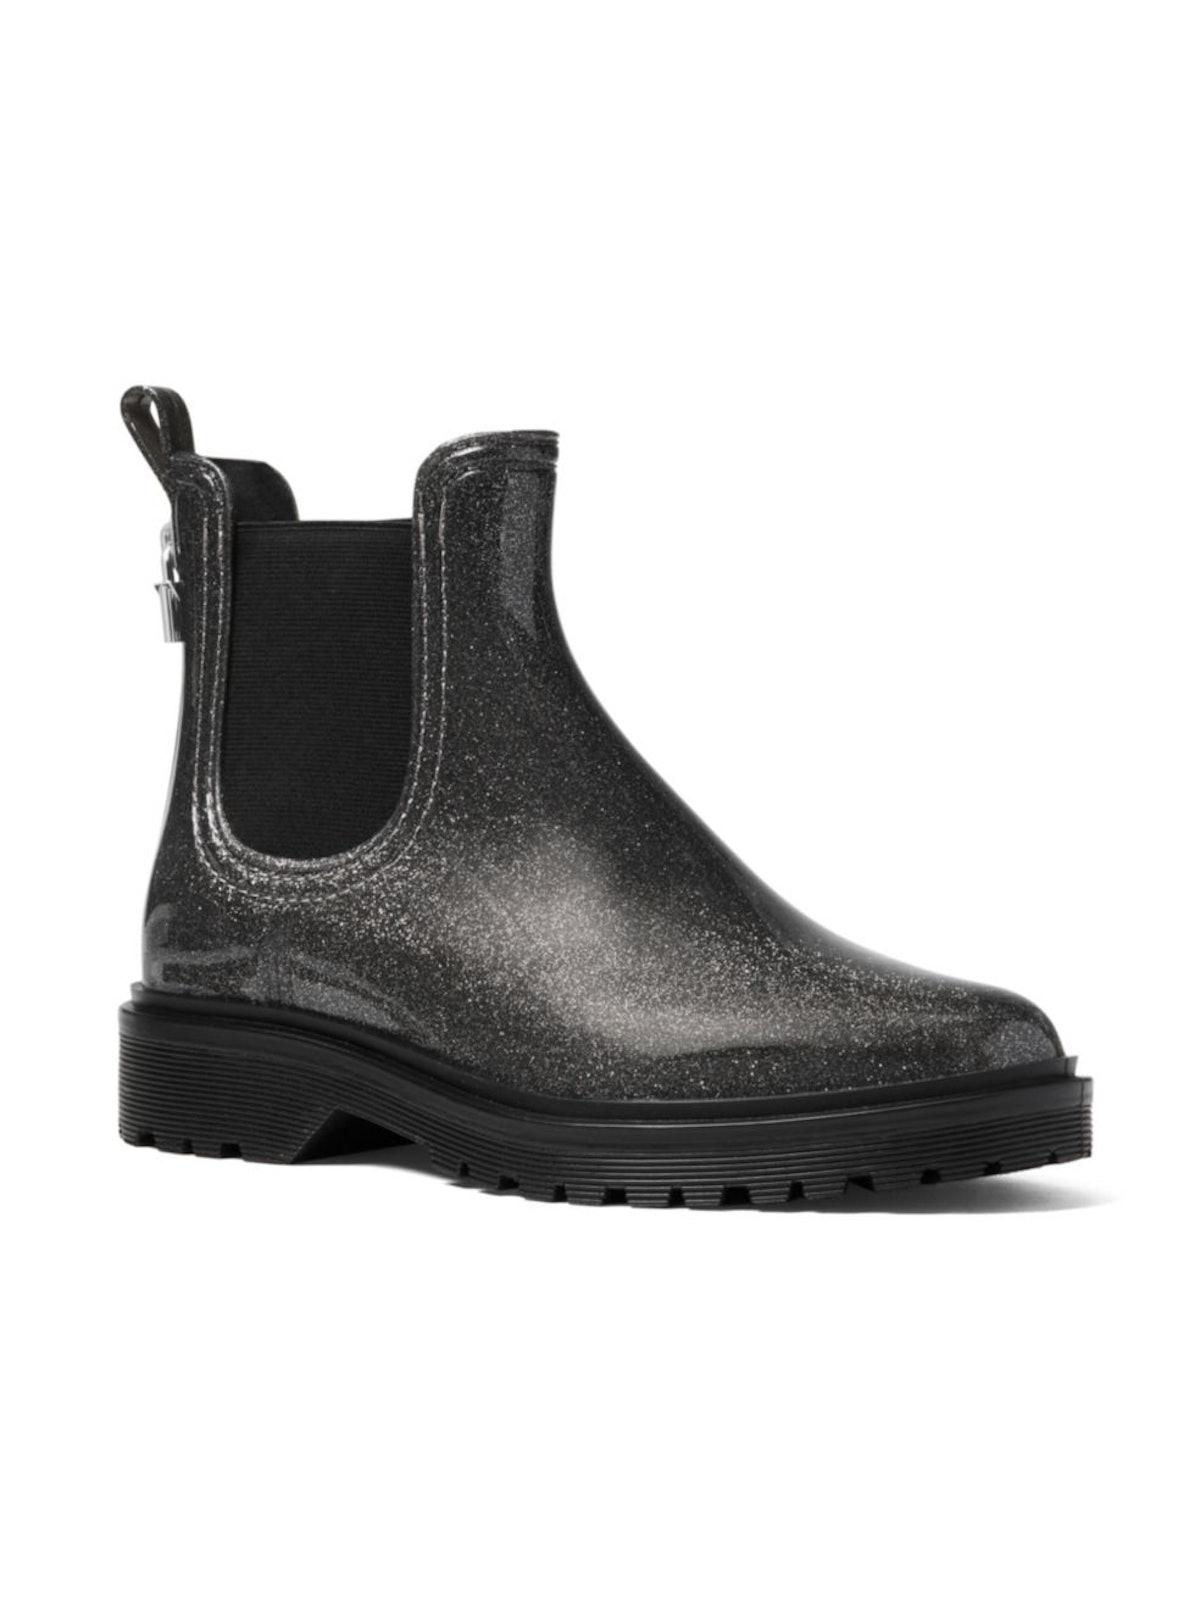 MICHAEL Michael Kors Tipton Metallic Rain Booties